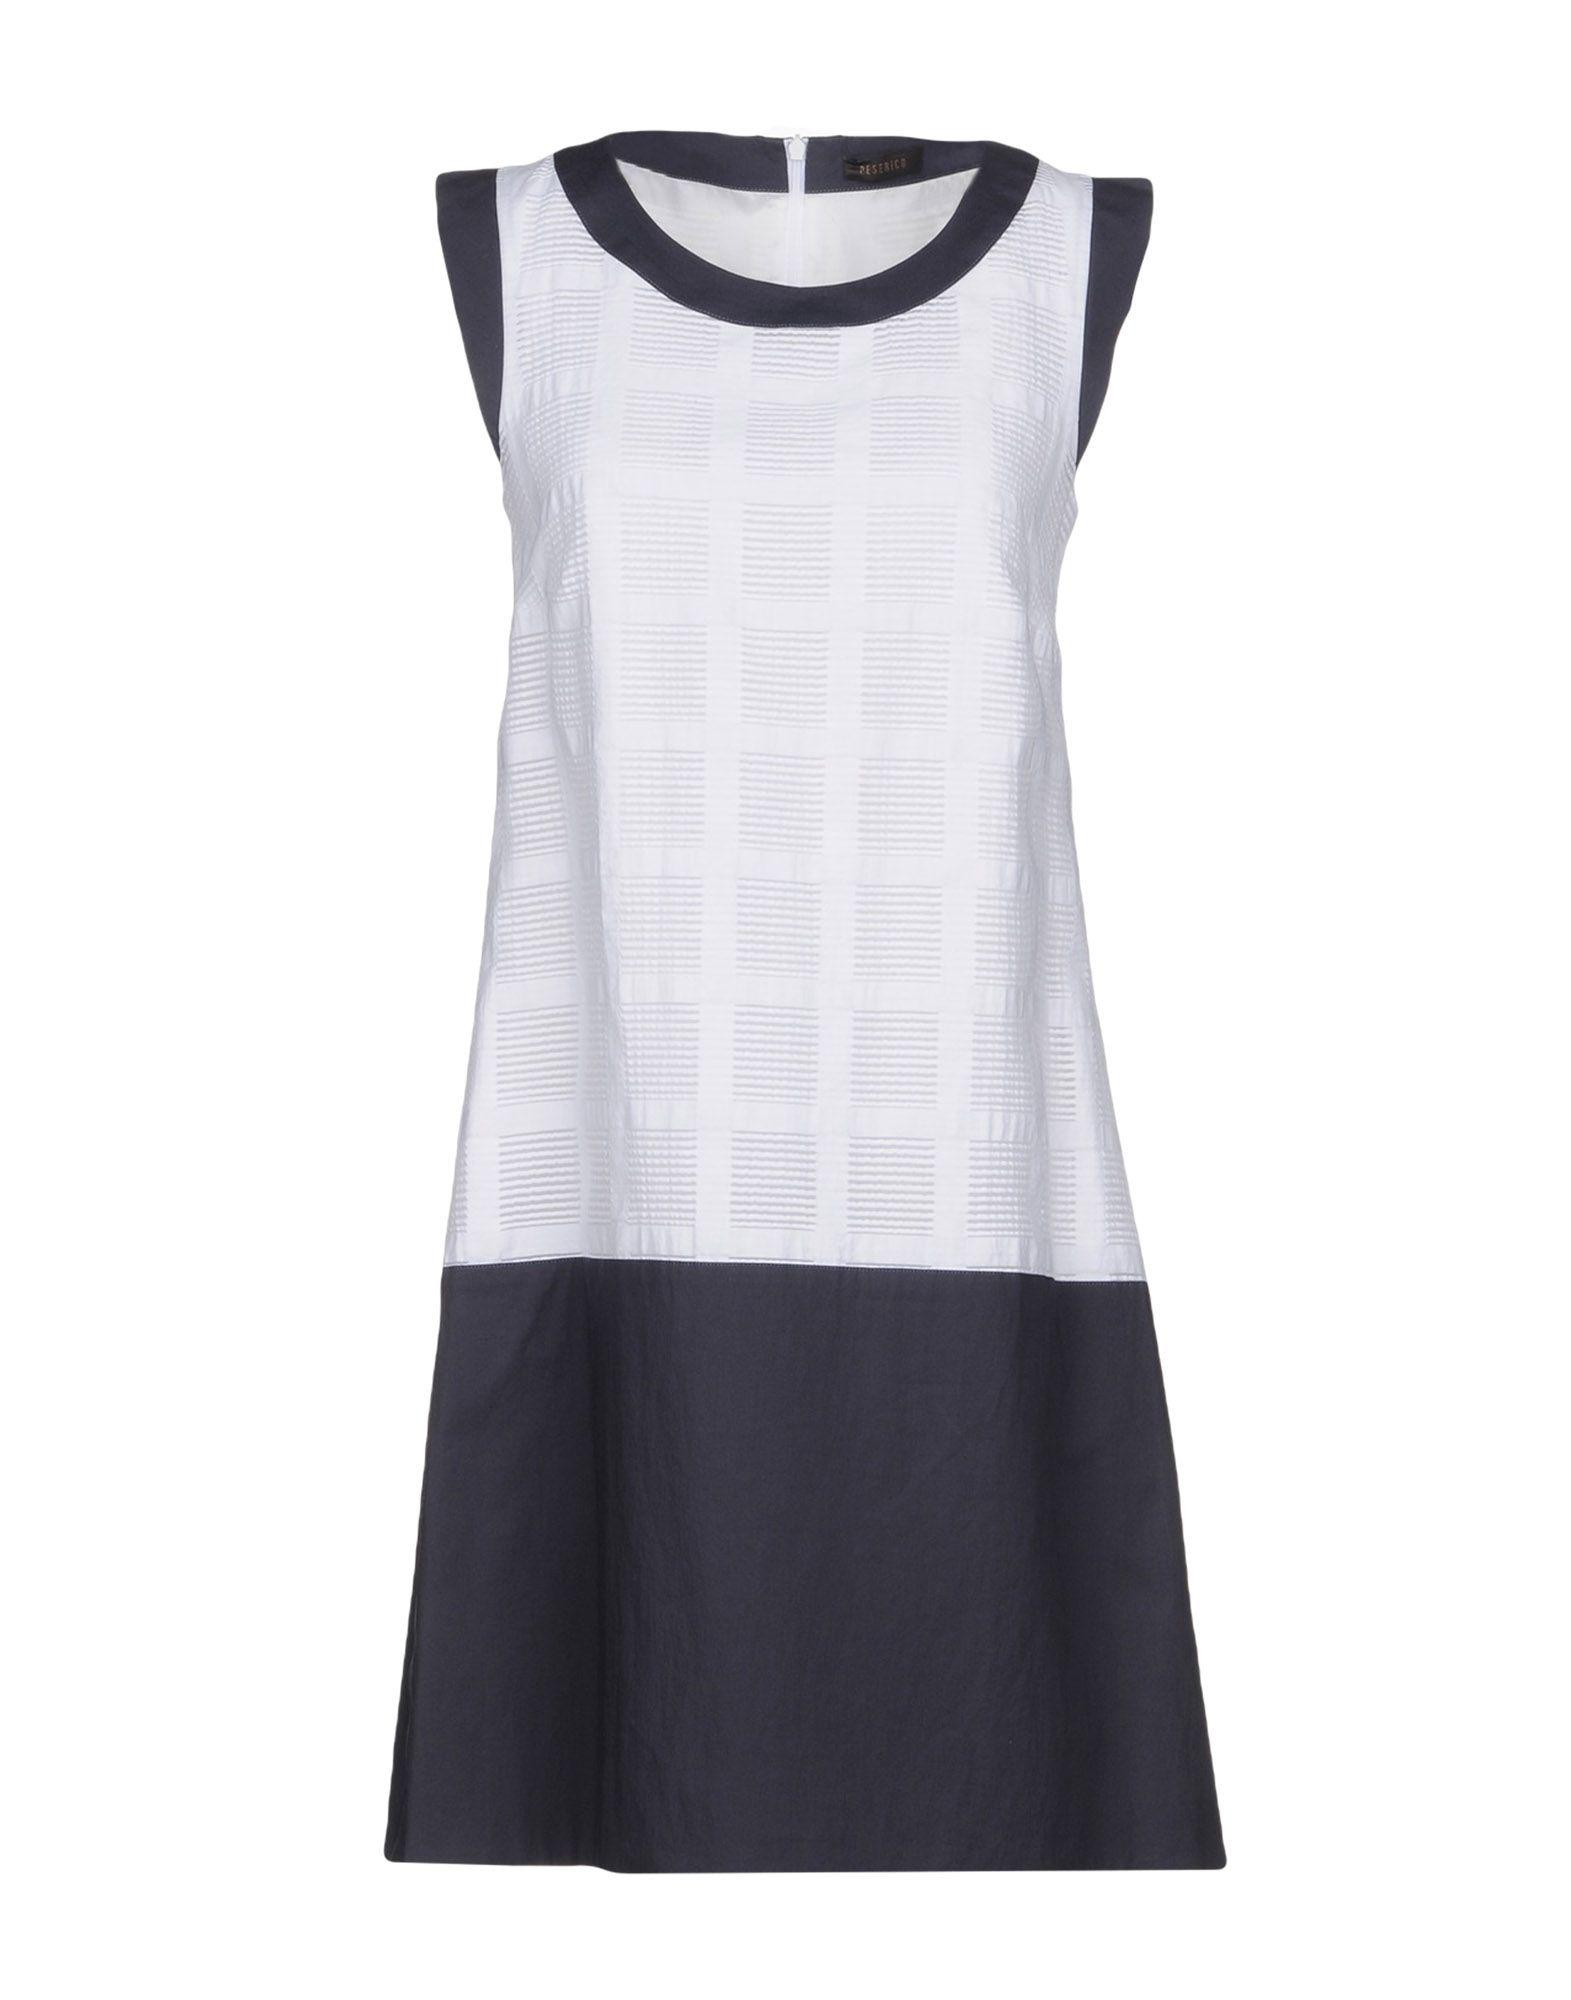 Sale New Styles Outlet For Sale DRESSES - Short dresses PESERICO Sale Largest Supplier Prices Cheap Online JvVLtp